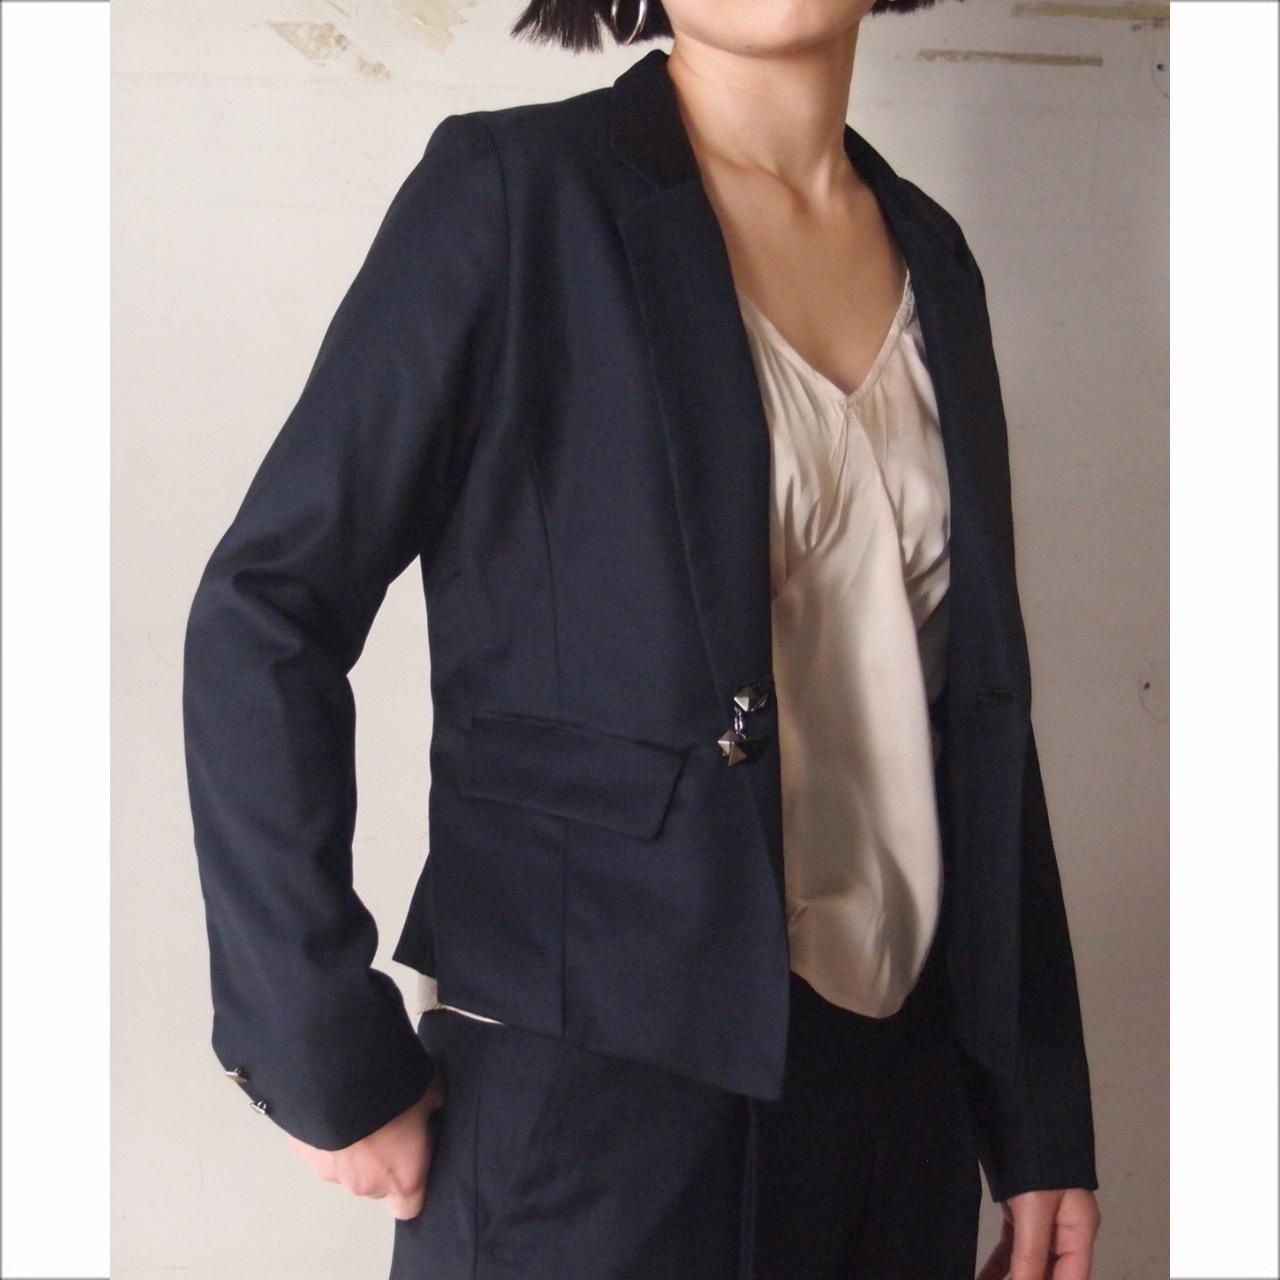 【hippiness】double face collar suit jacket/【ヒッピネス】ダブル フェイス カラー スーツ ジャケット